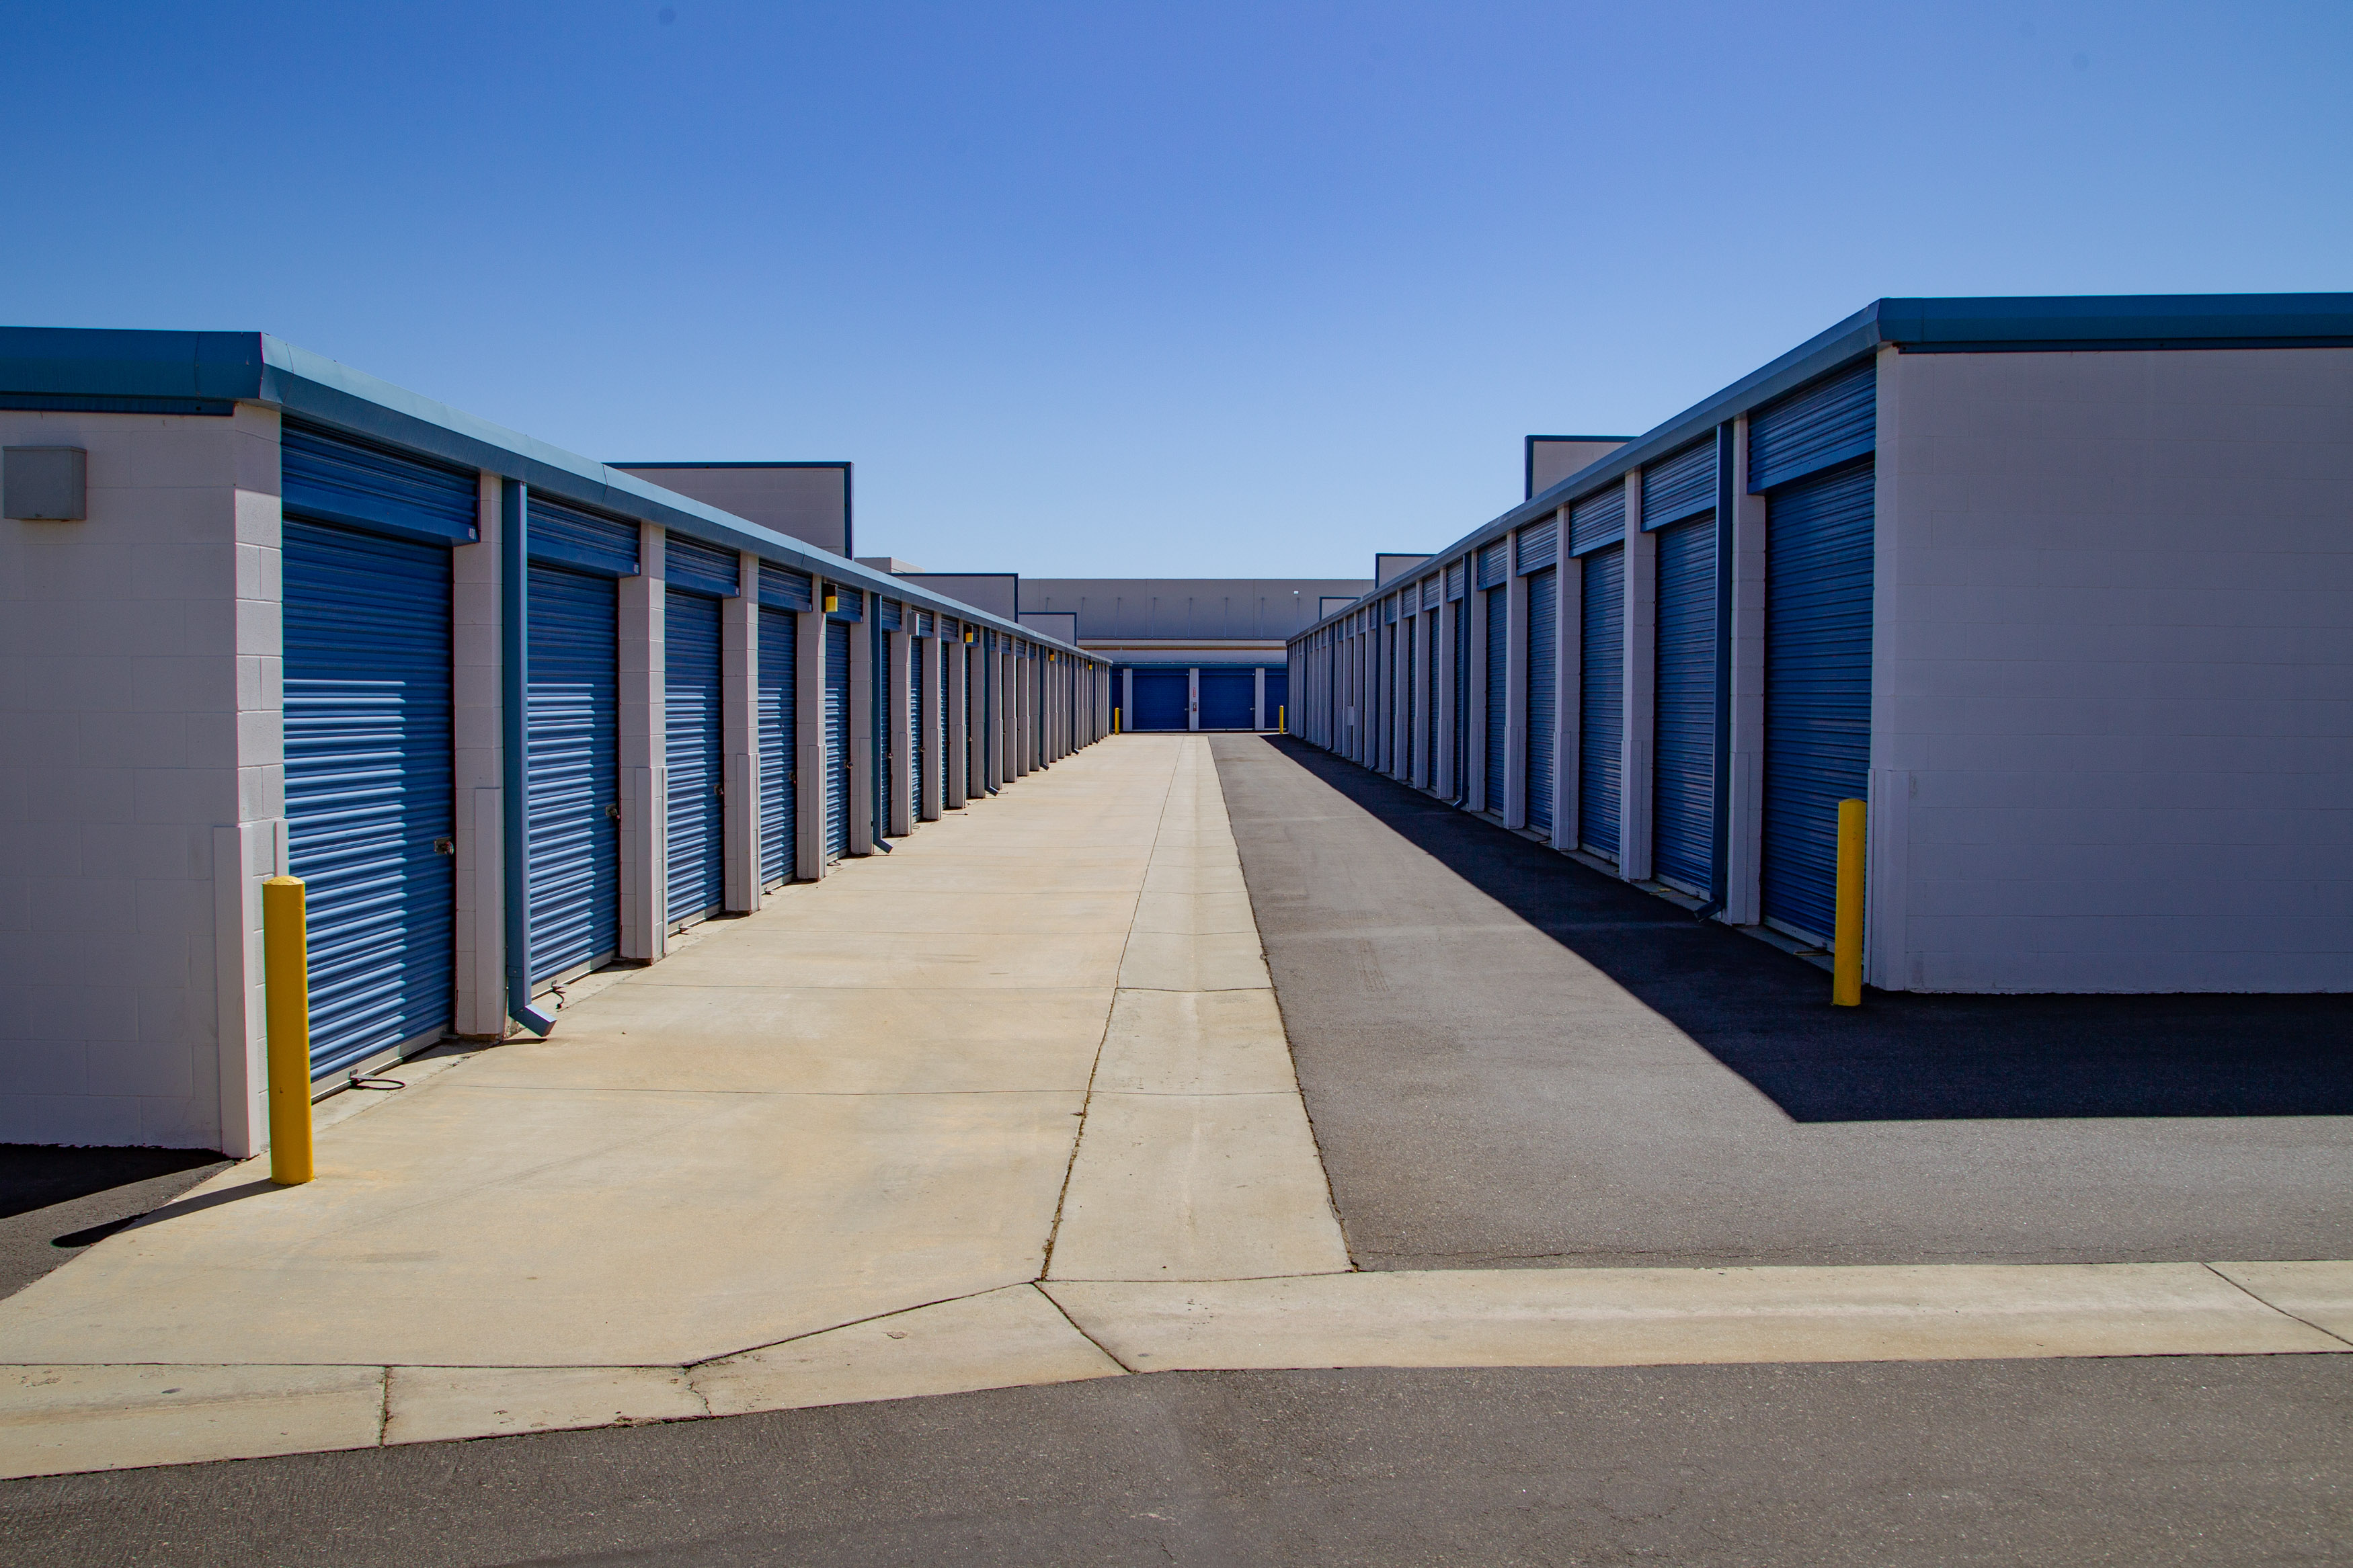 Ranpac Self Storage Facility in Temecula, CA